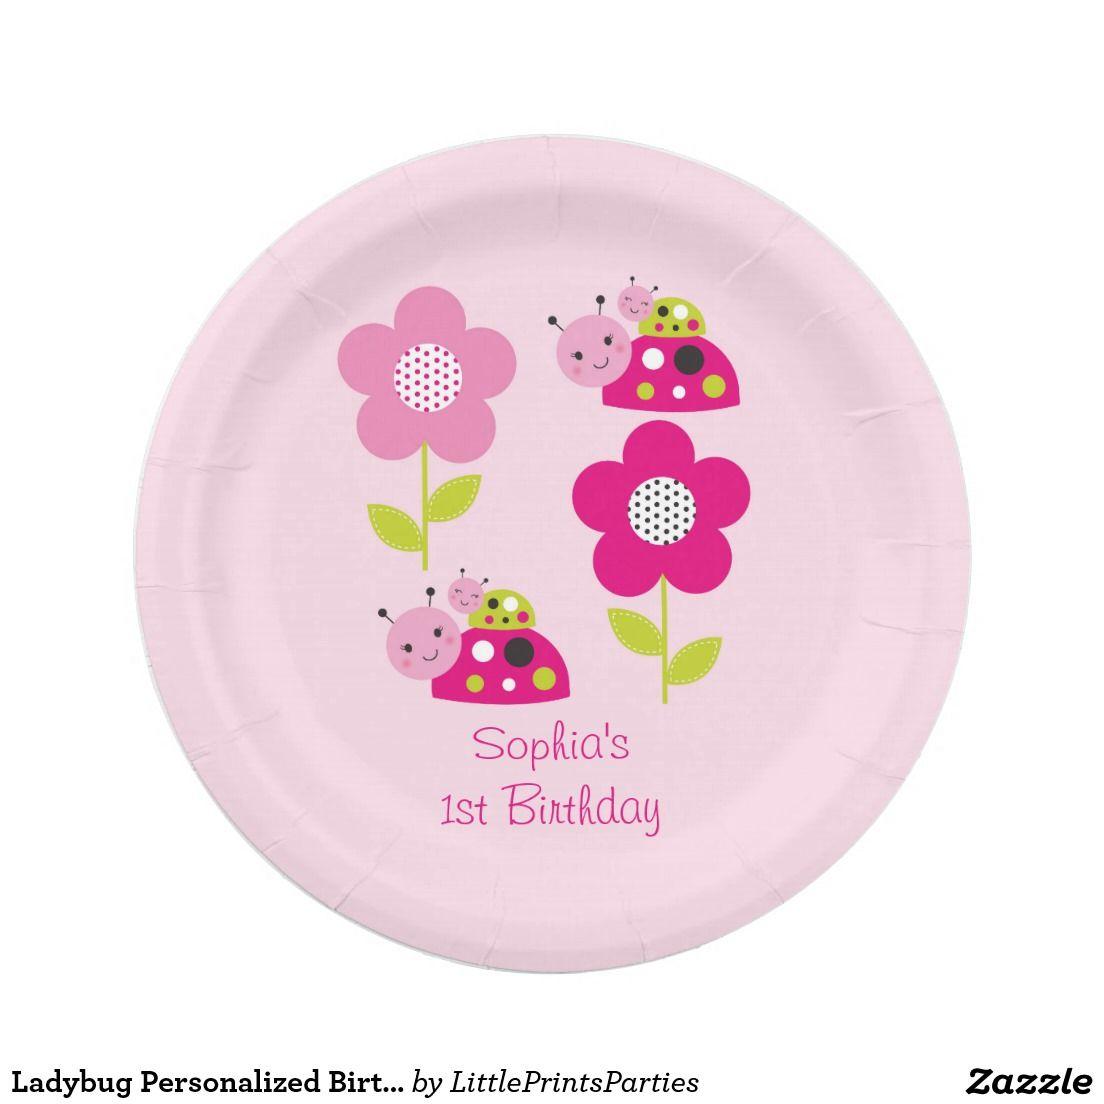 Ladybug Personalized Birthday Plates  sc 1 st  Pinterest & Ladybug Personalized Birthday Plates | Birthday plate and Birthdays